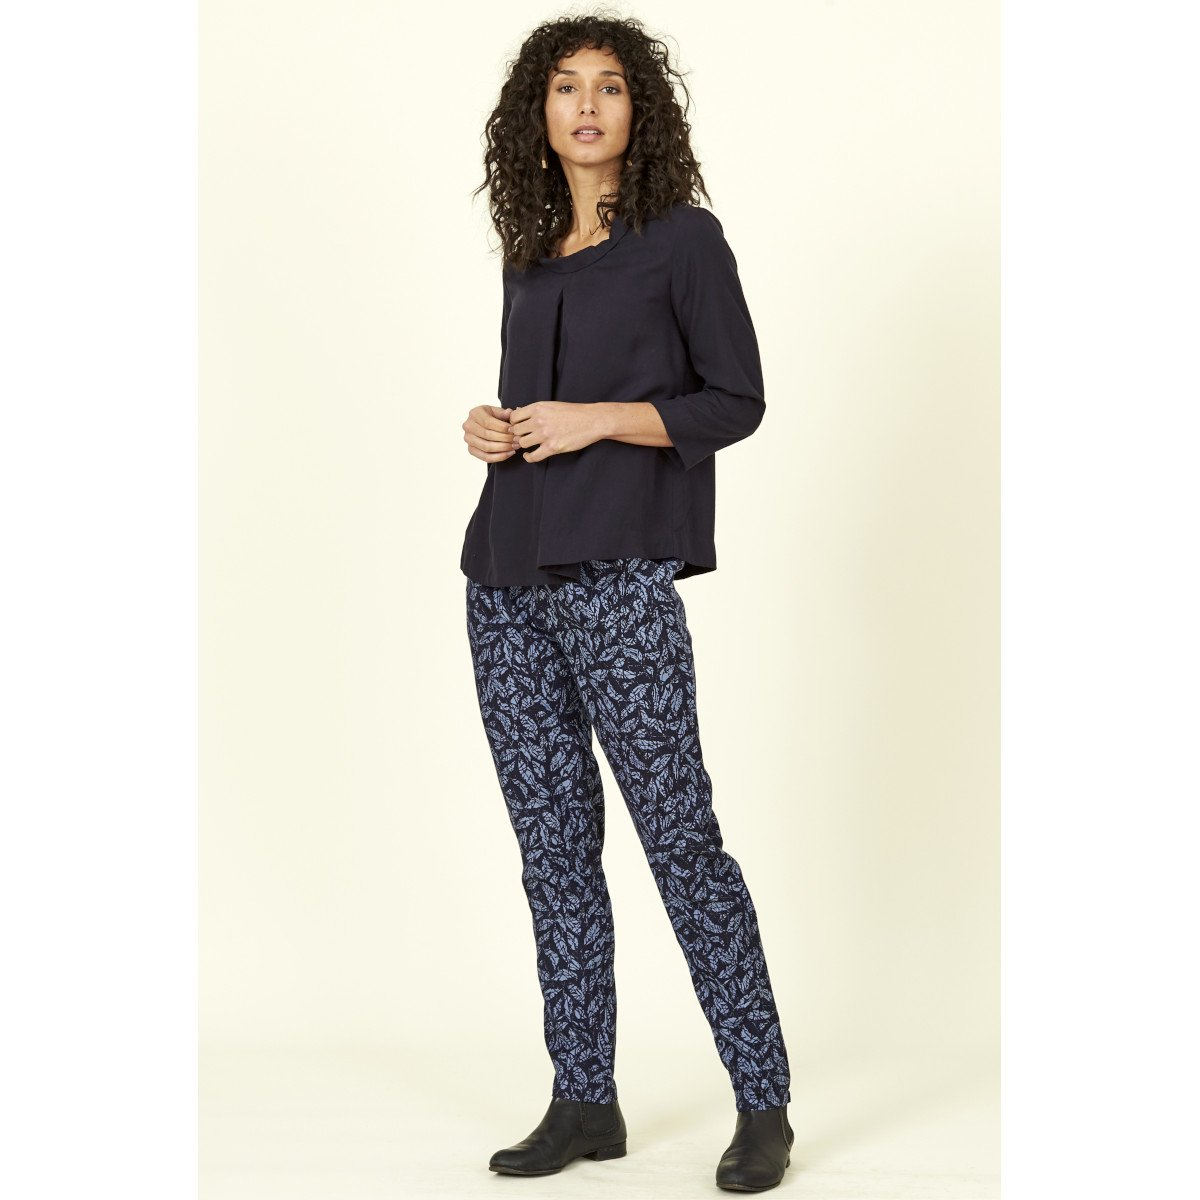 Pantaloni Foglie Batik Blu in Lyocell Tencel